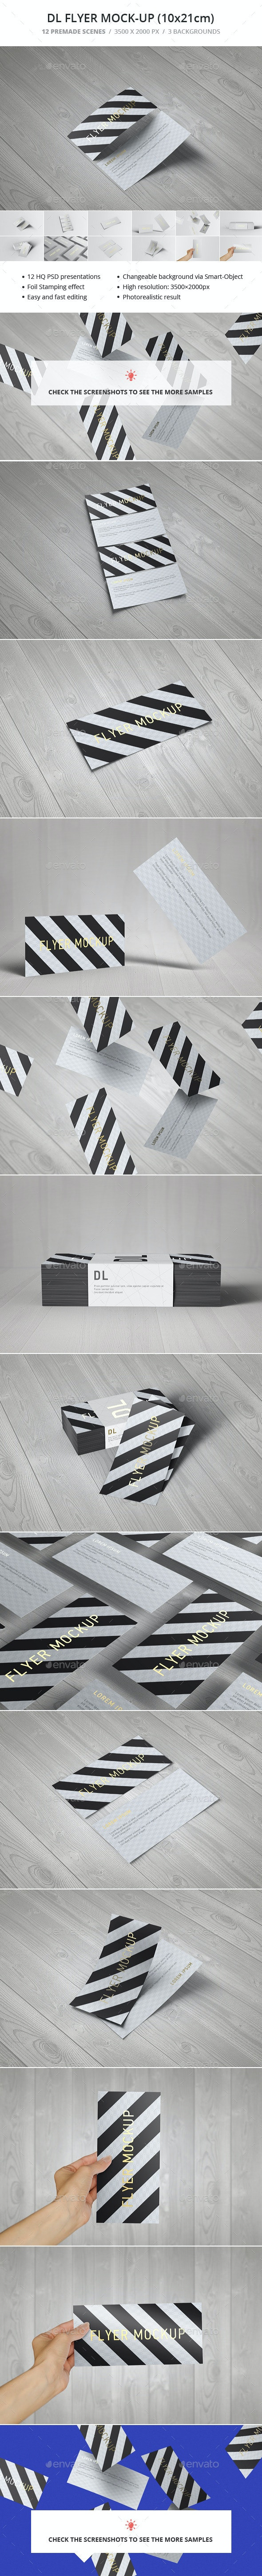 DL Flyer Mock-up - Flyers Print